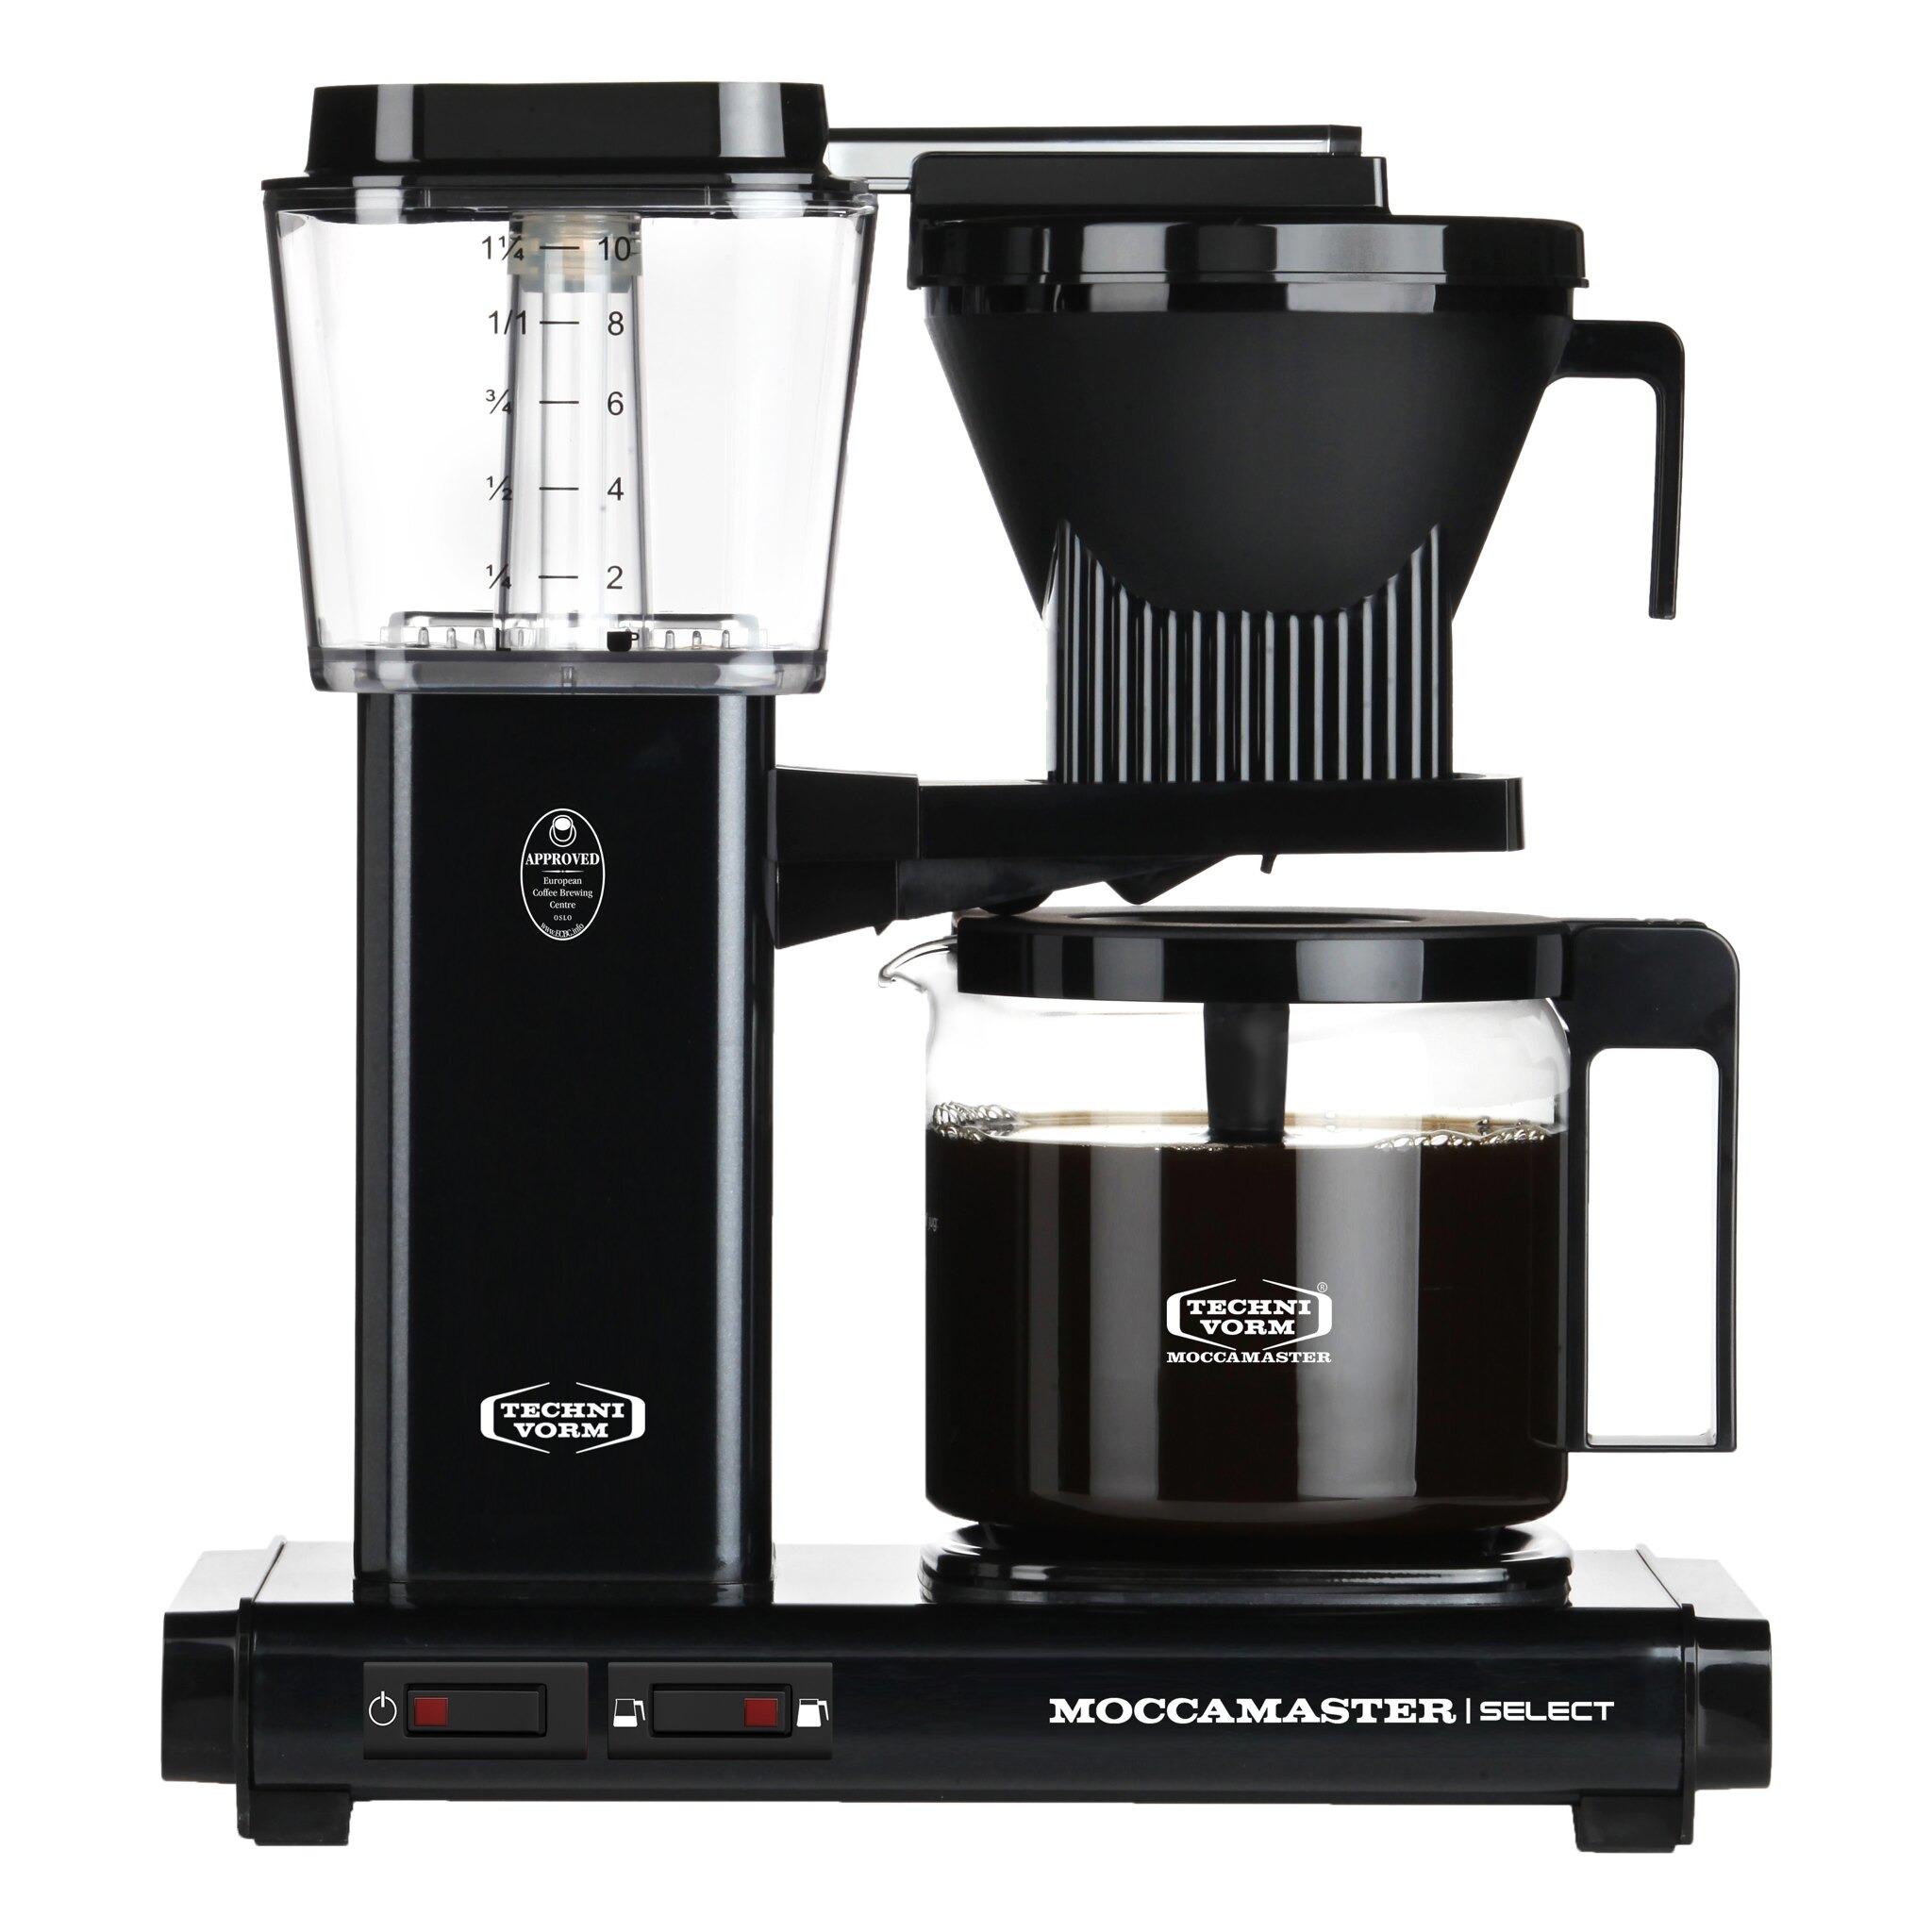 Moccamaster koffiefilter apparaat KBG SELECT mat zwart kopen